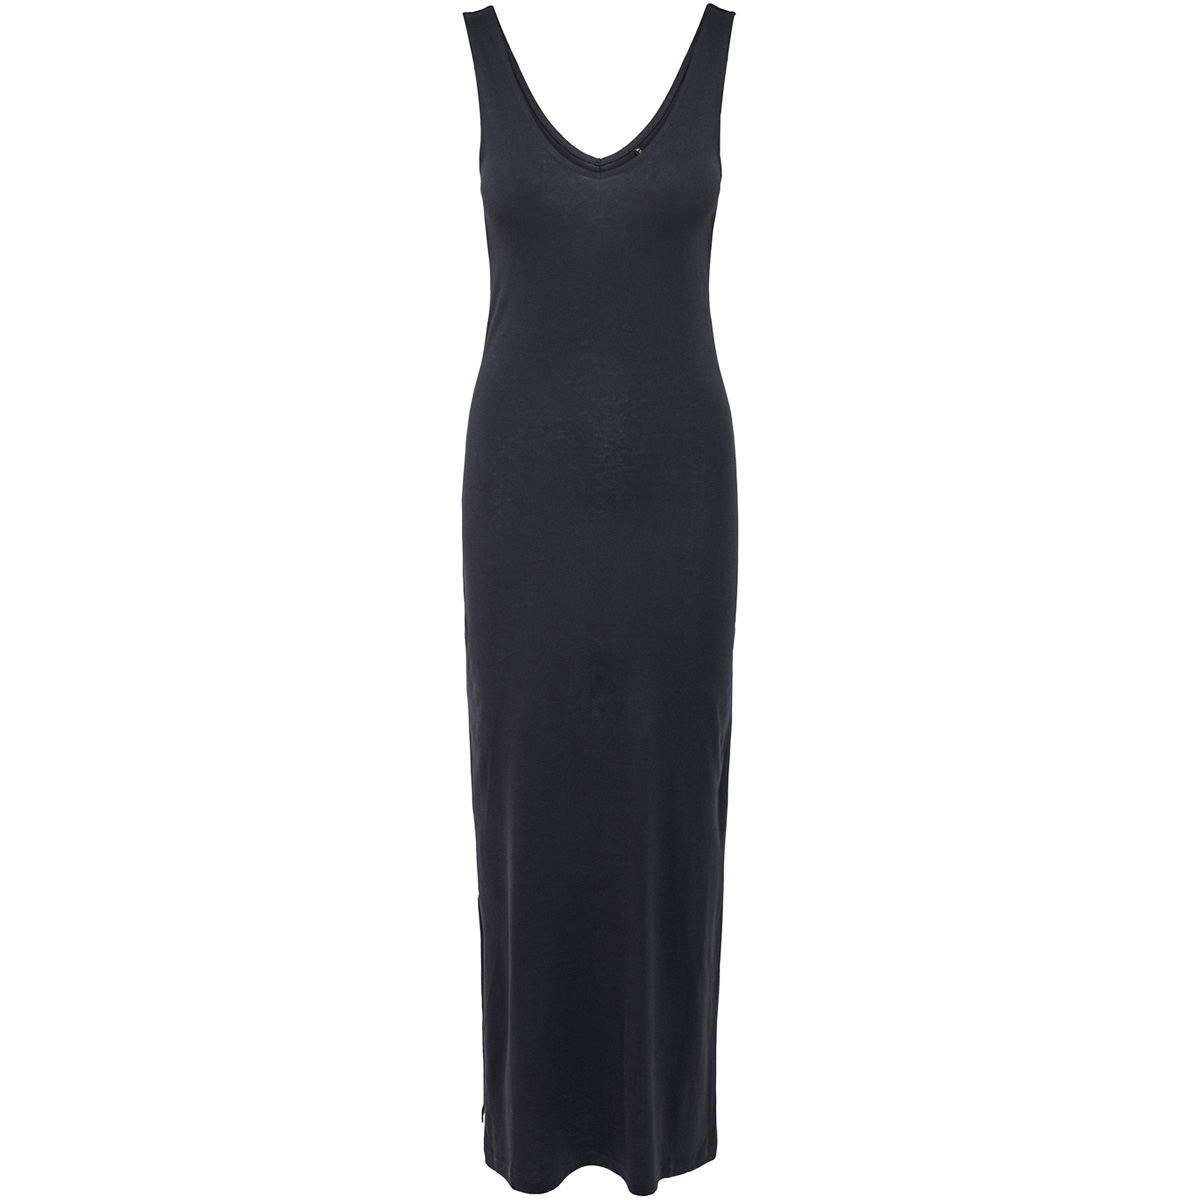 onljuly s/l long v-neck dress noos 15176104 only jurk night sky